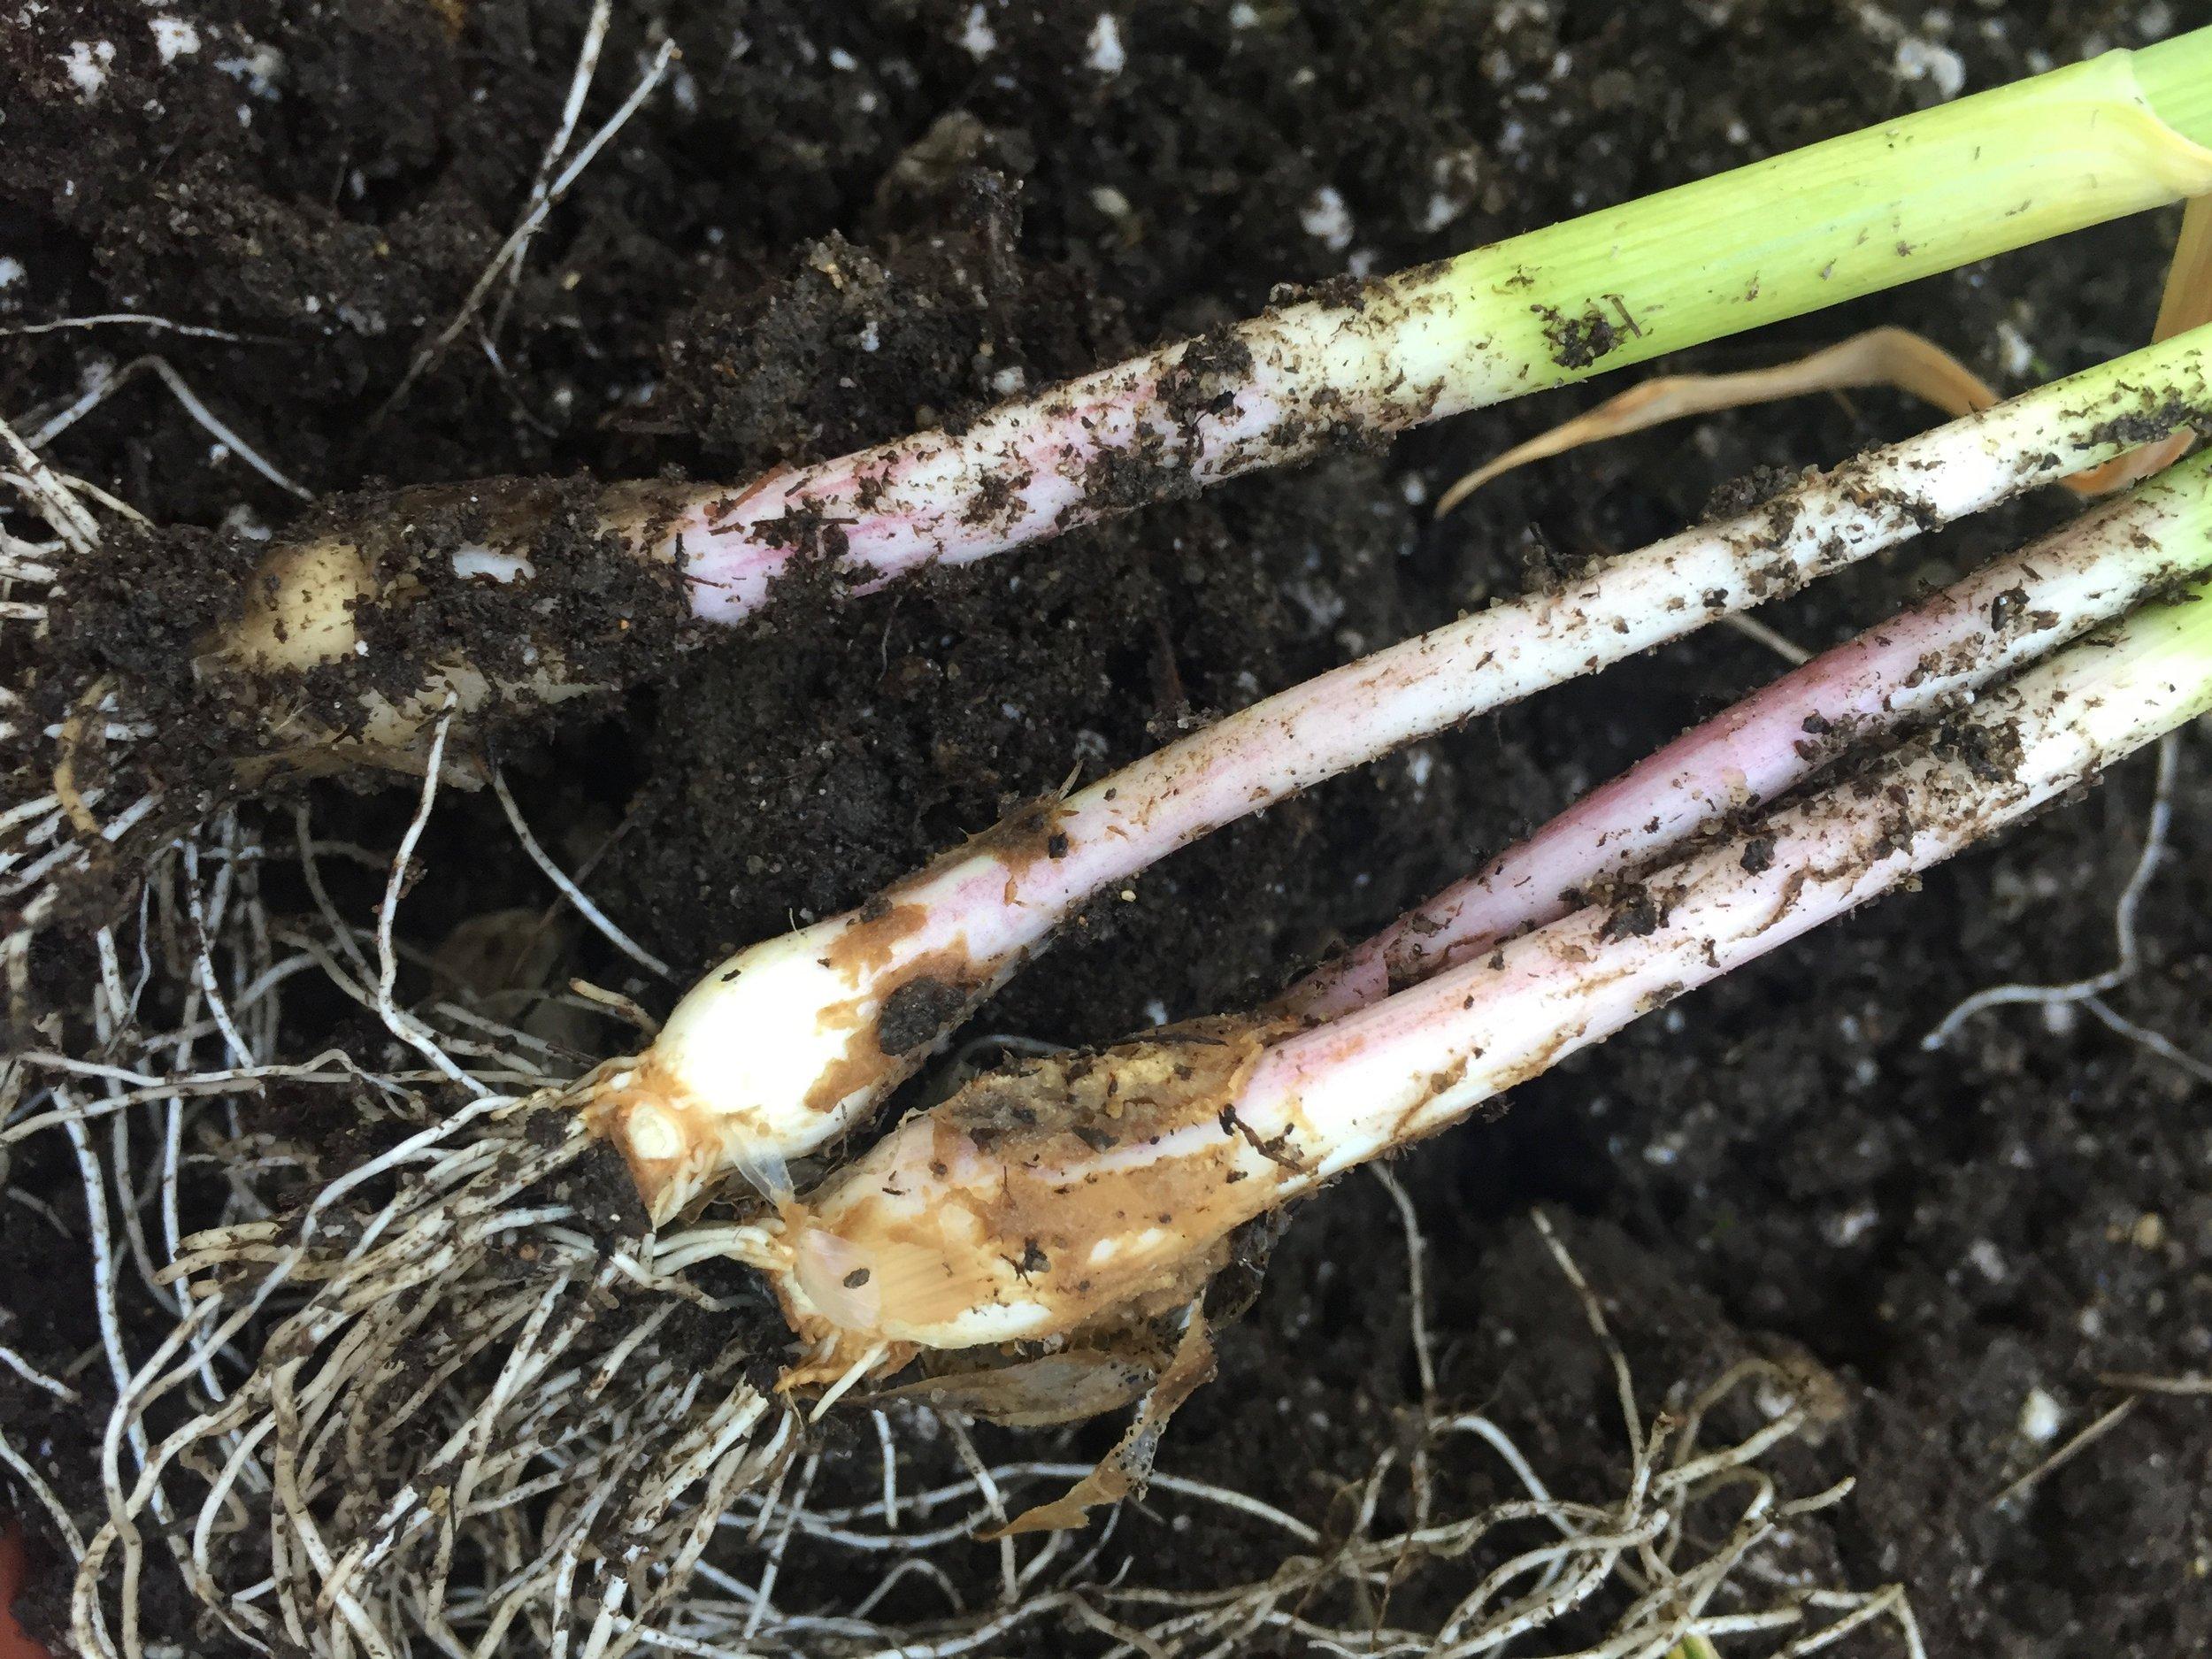 Garlic - pulled